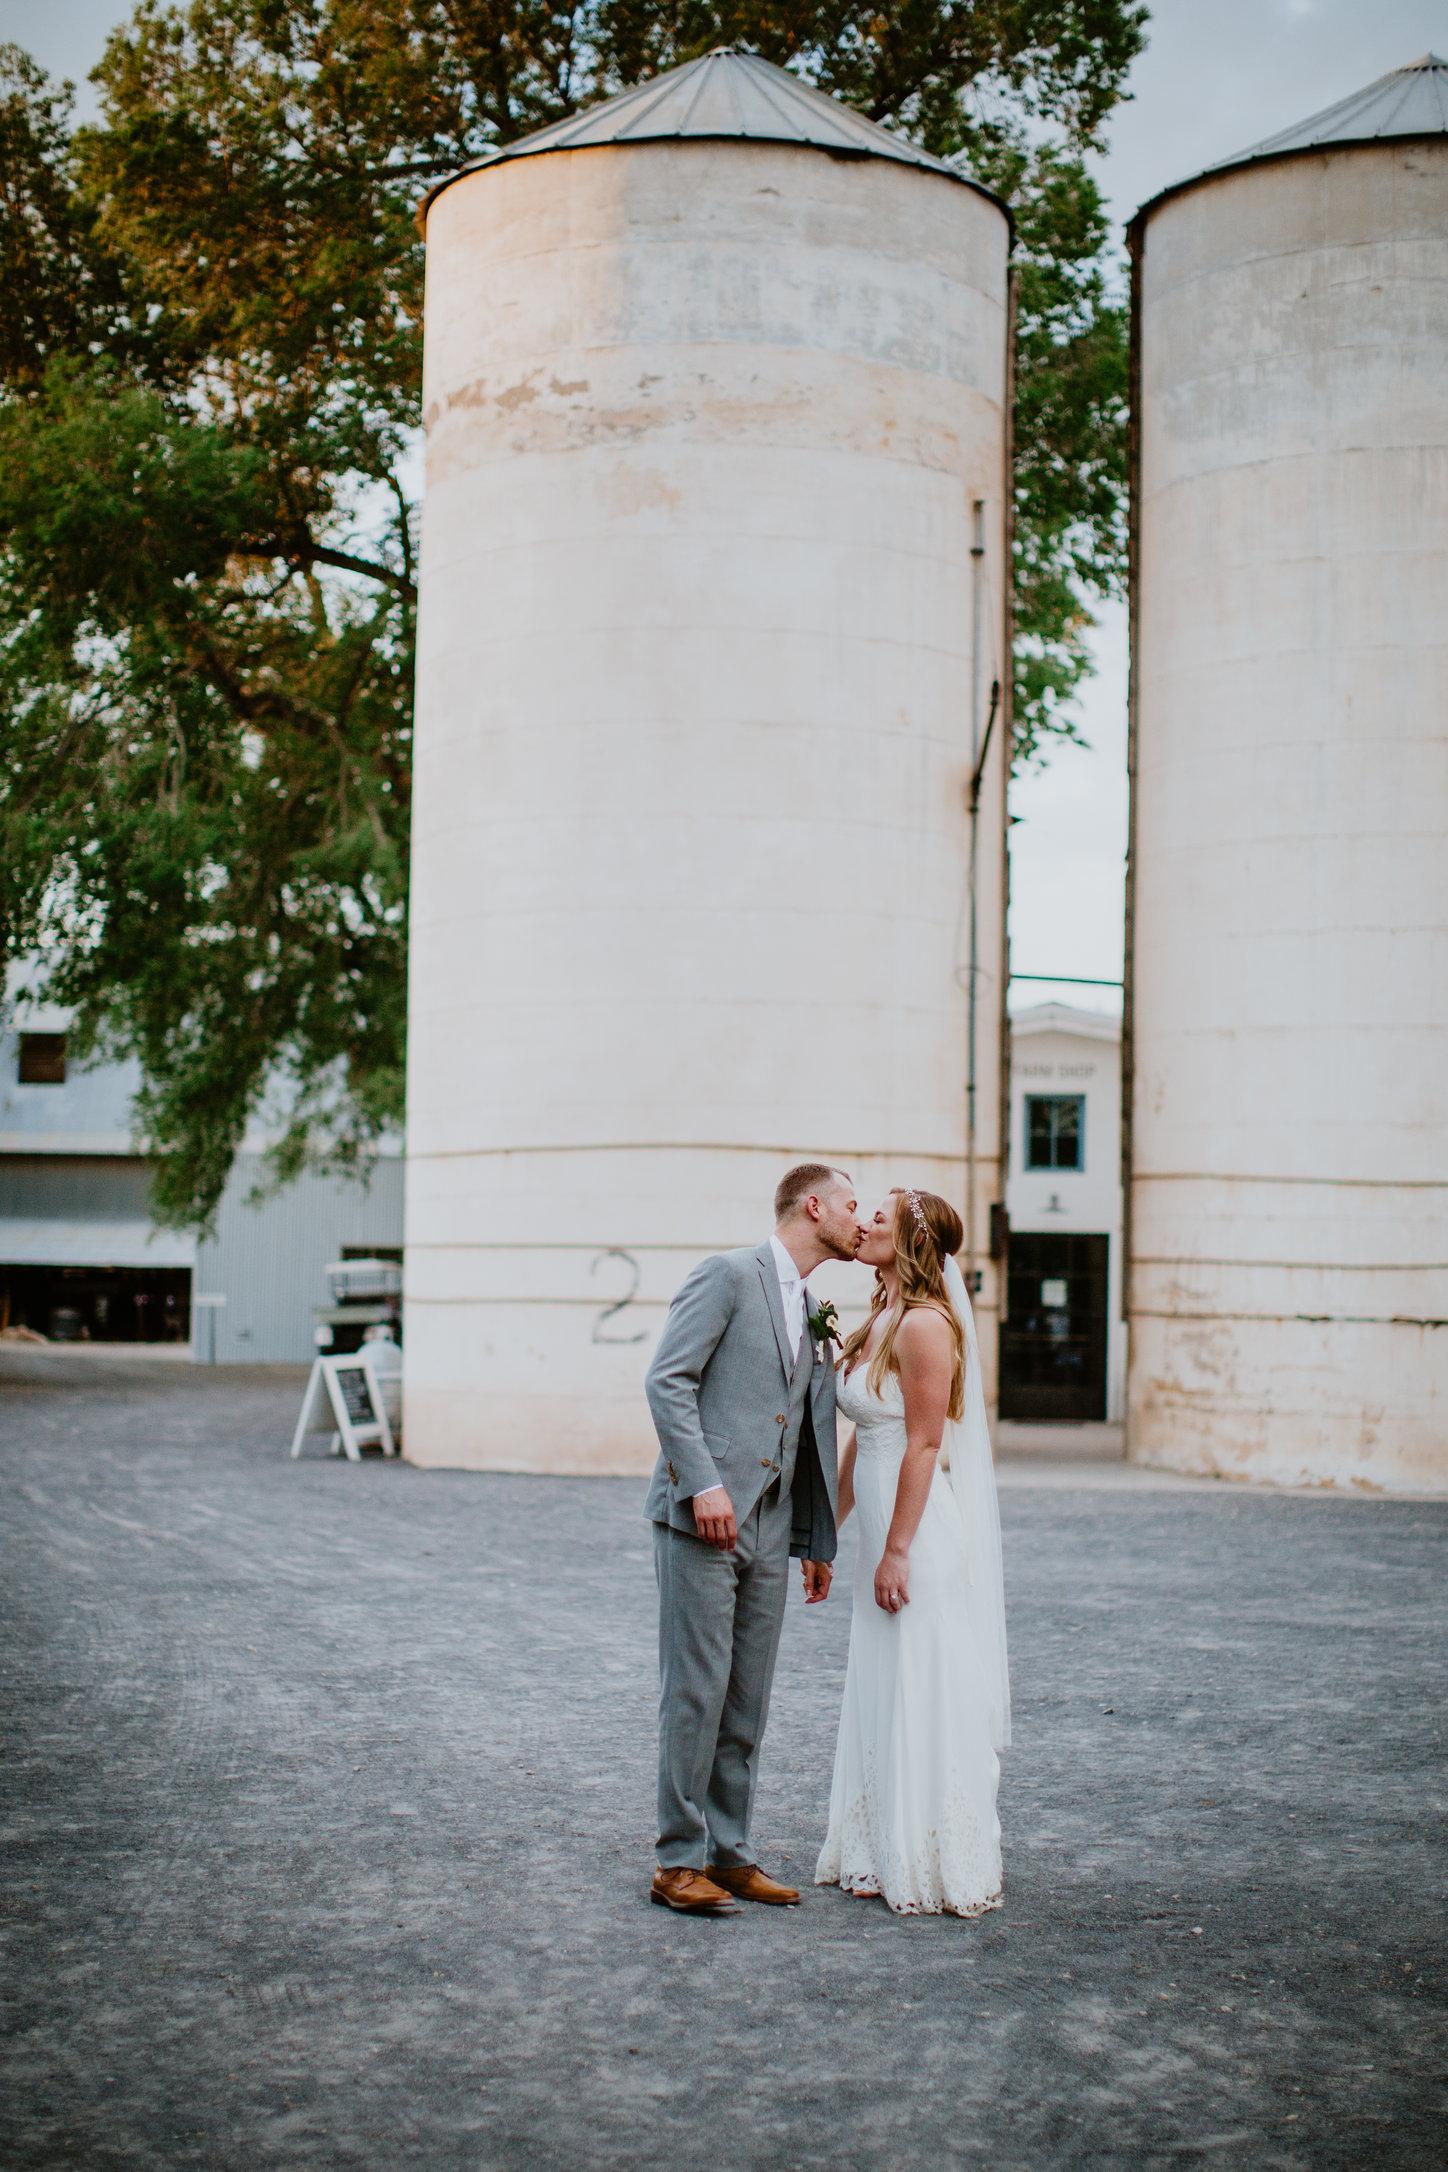 DandA-wedding-752.jpg